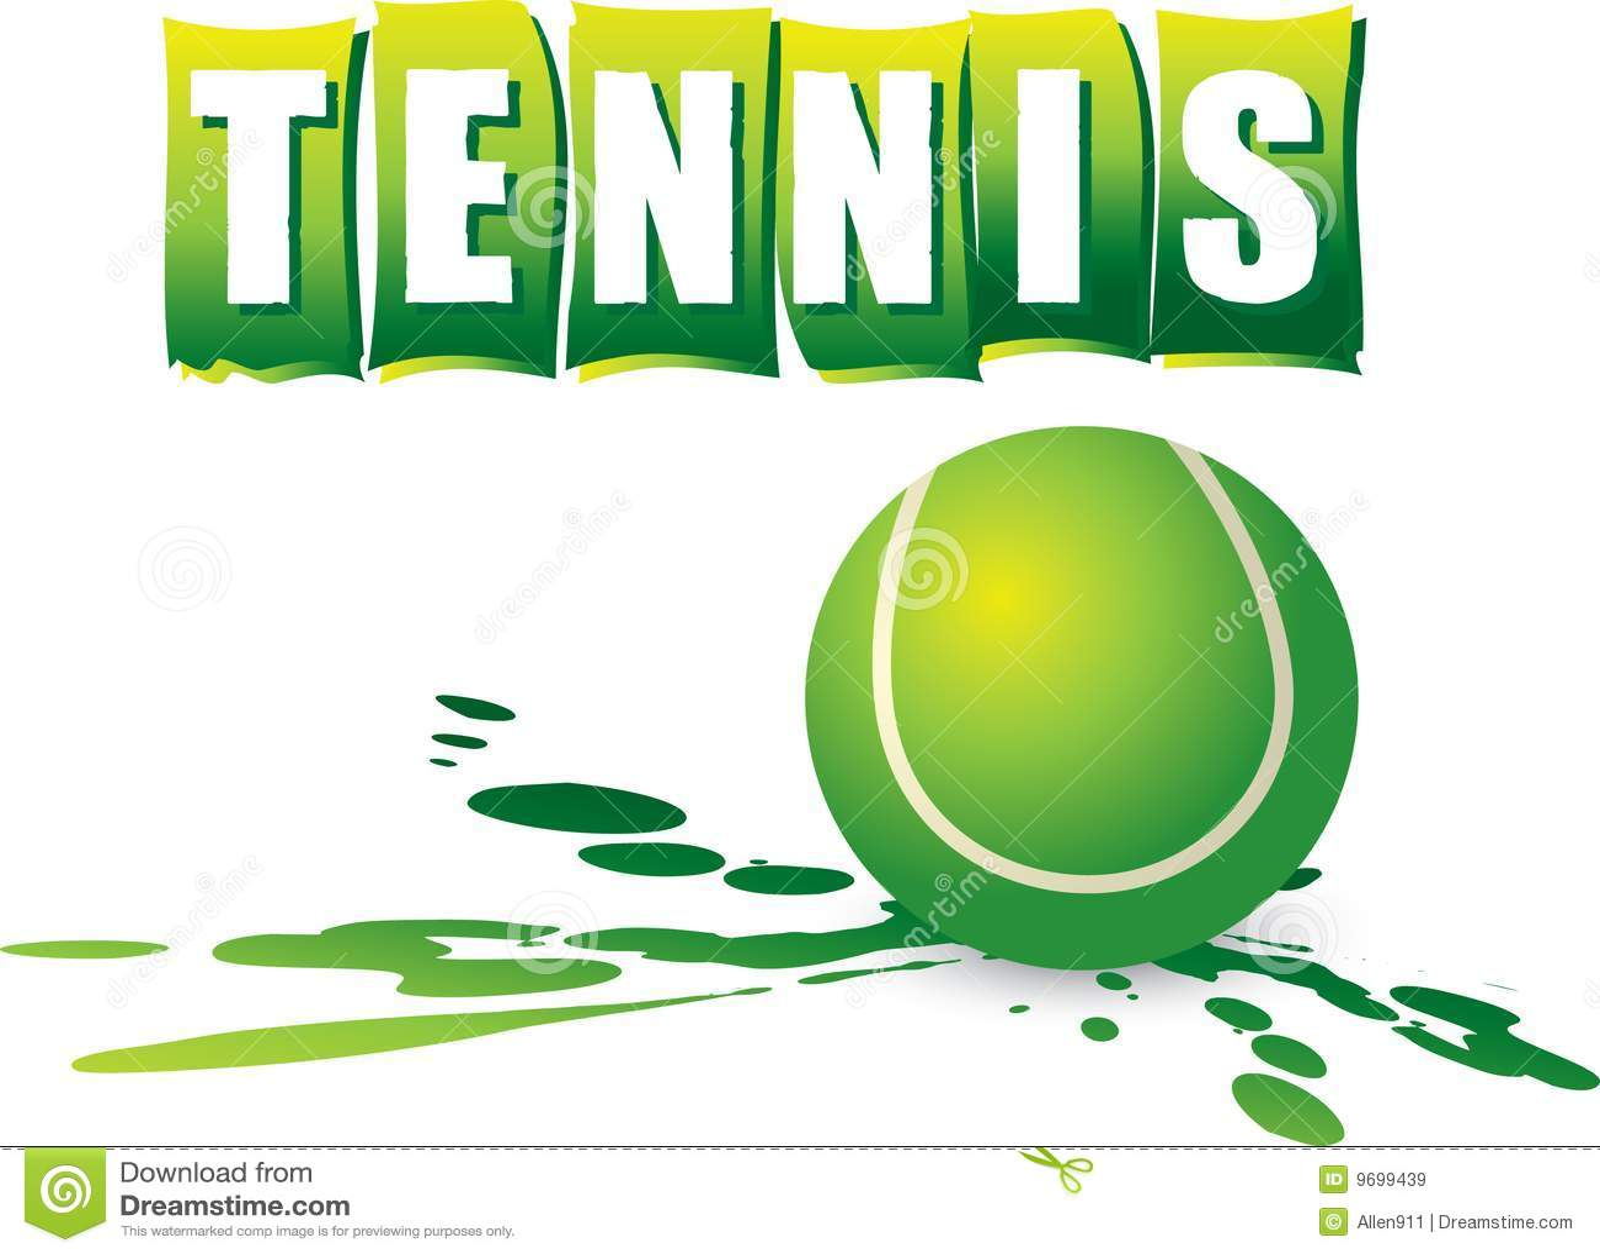 Tennis Banner Stock Illustrations 5 696 Tennis Banner Stock Illustrations Vectors Clipart Dreamstime